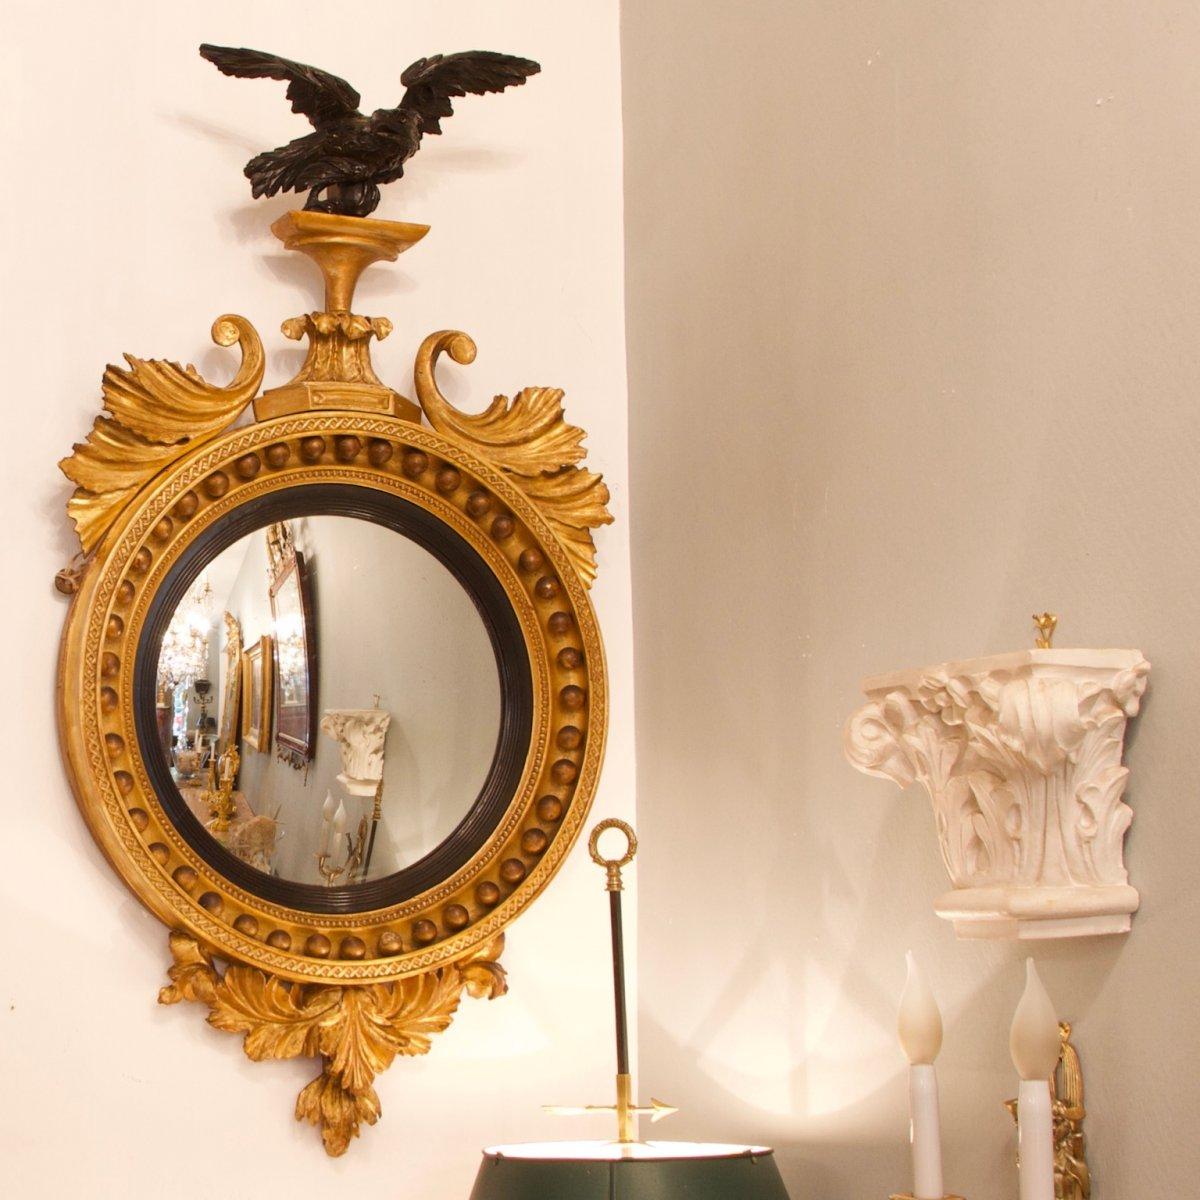 English Early 19th Century Regency Gilt And Ebonized Convex Wall Mirror